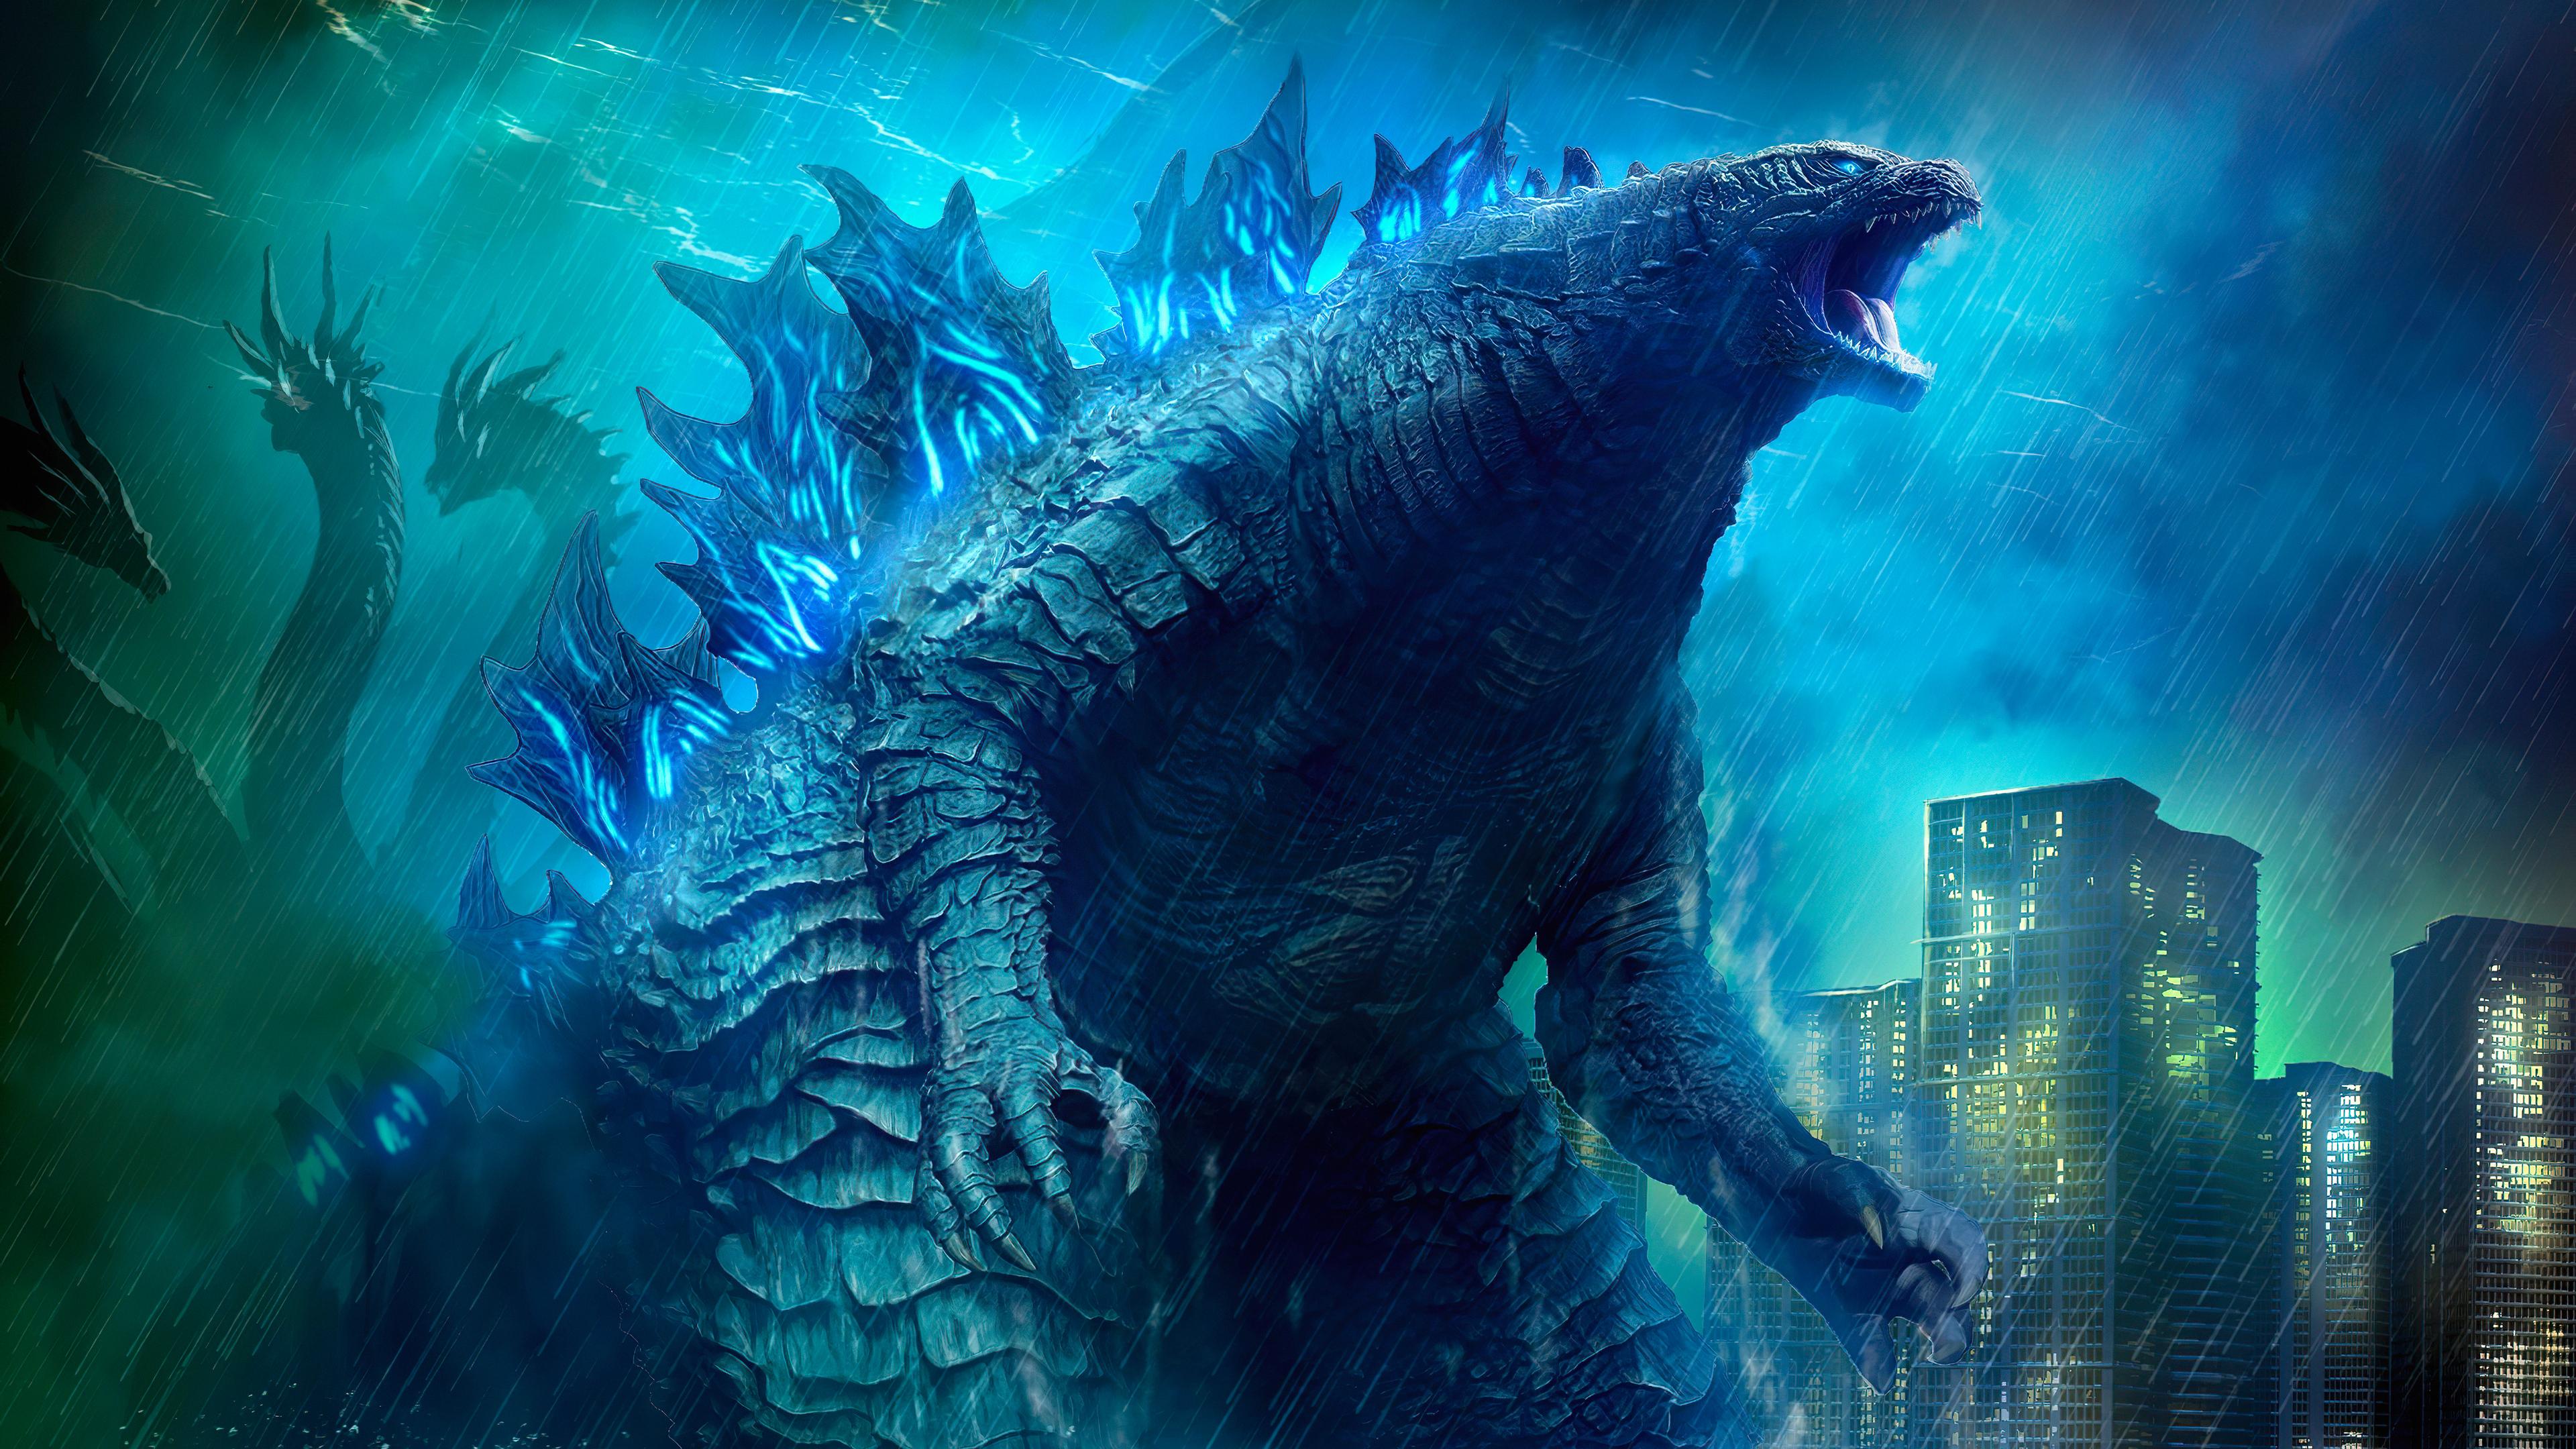 3840x2160 Godzilla King Of The Monsters Movie 4k Art 4k HD ...